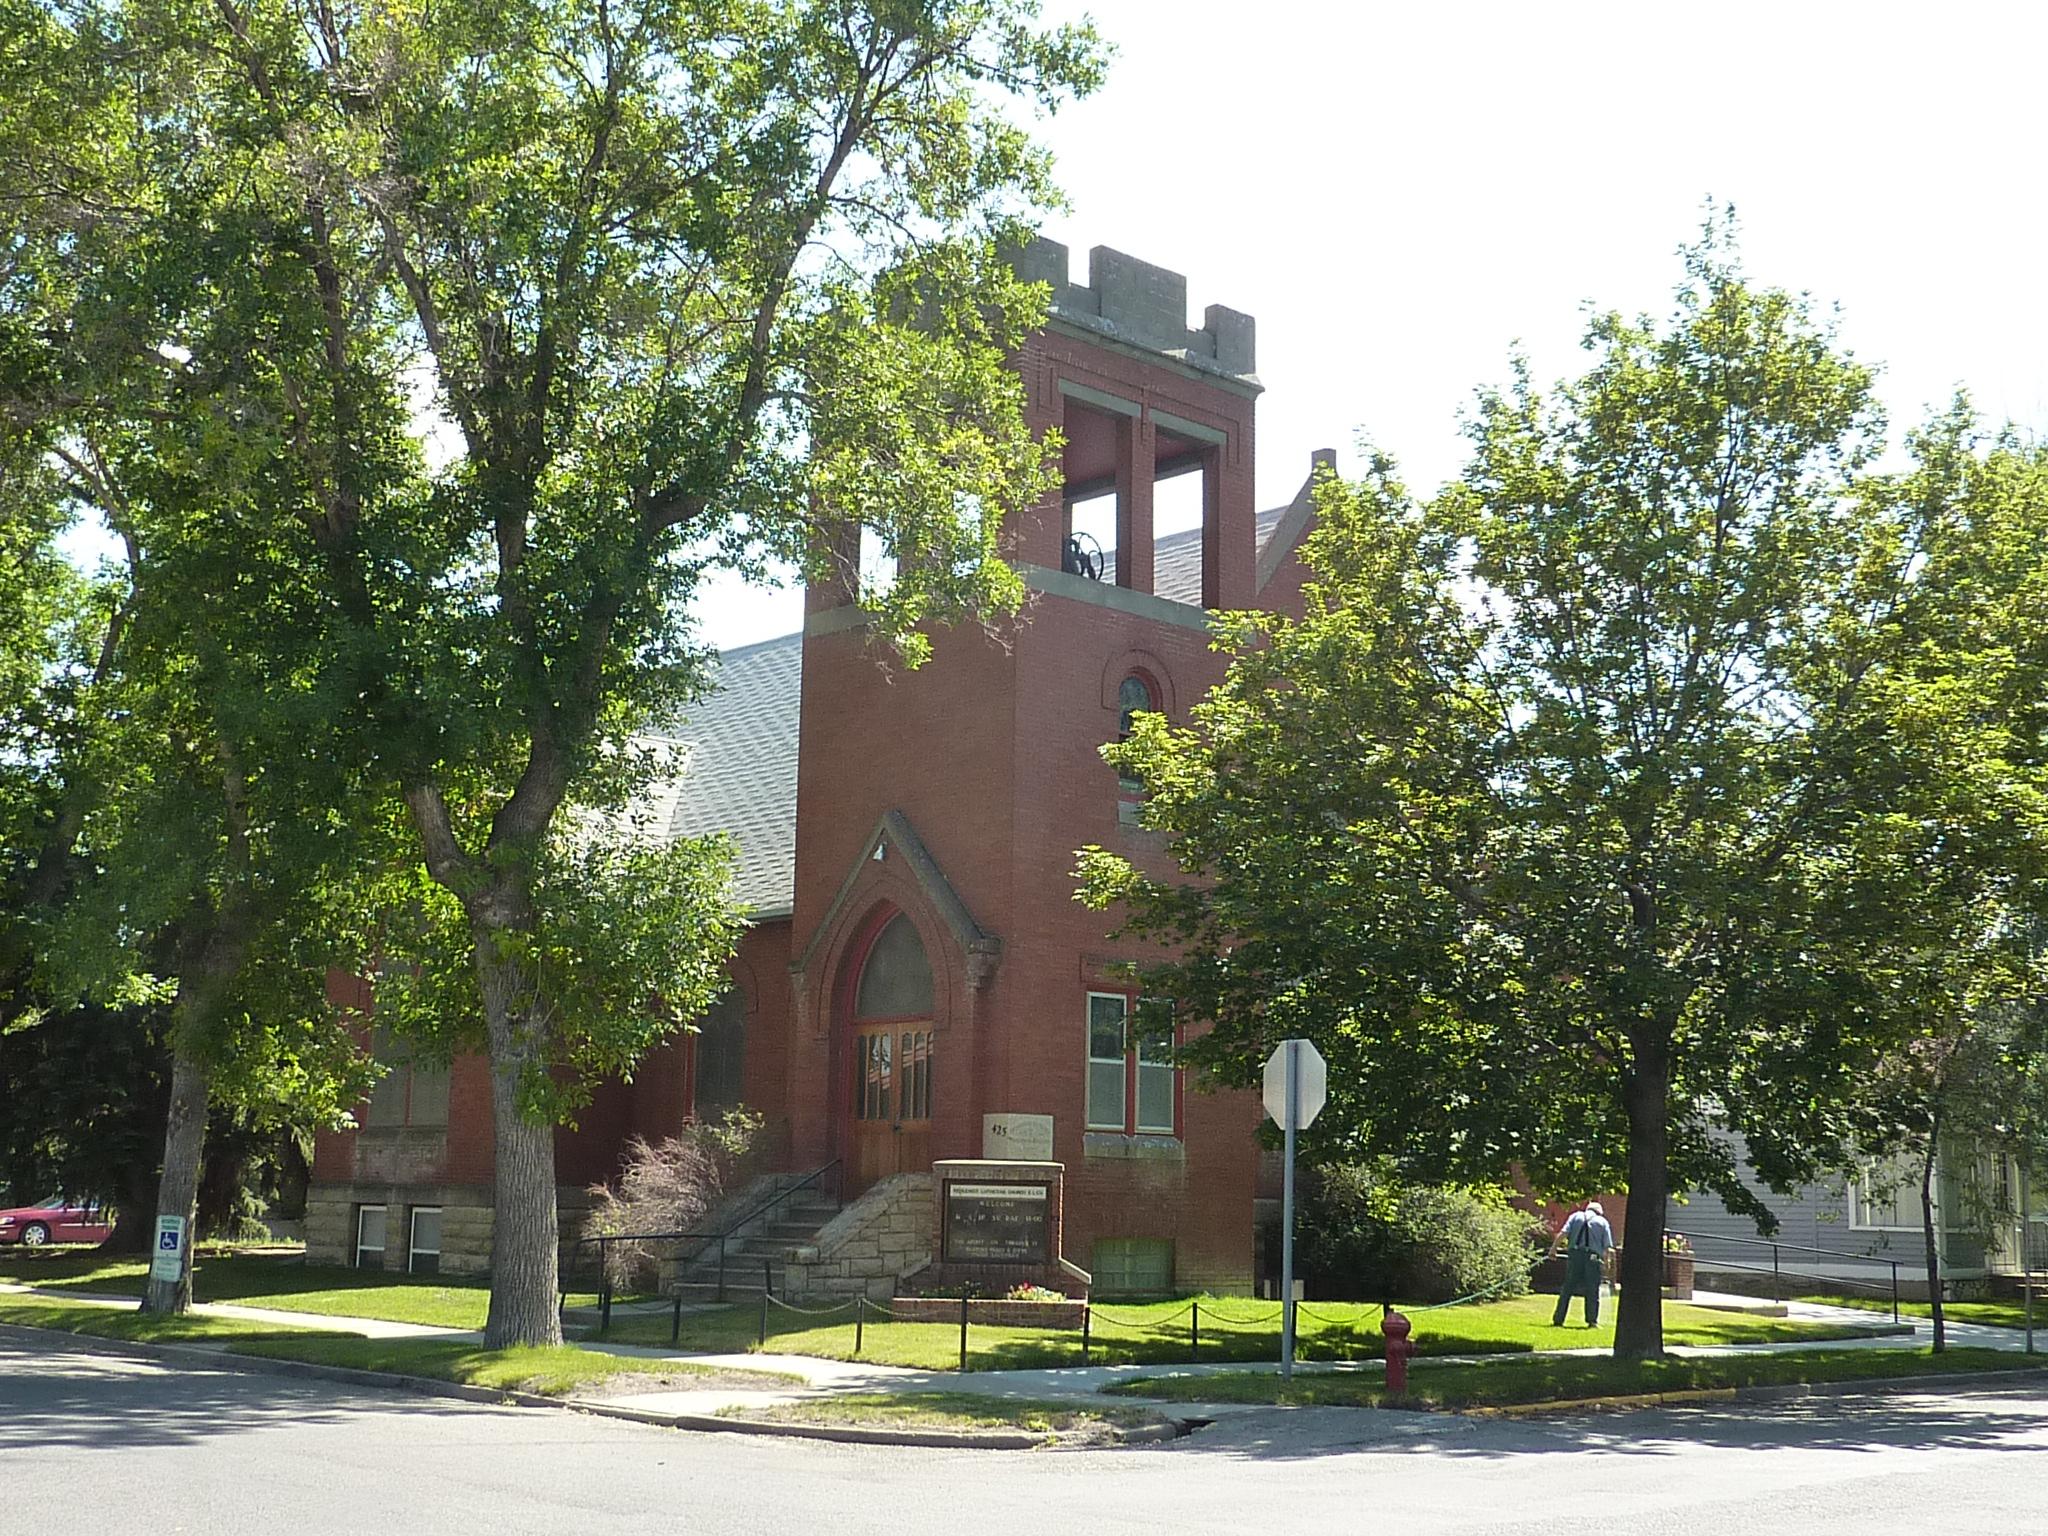 Redeemer Lutheran Church Peoria Il Food Pantry